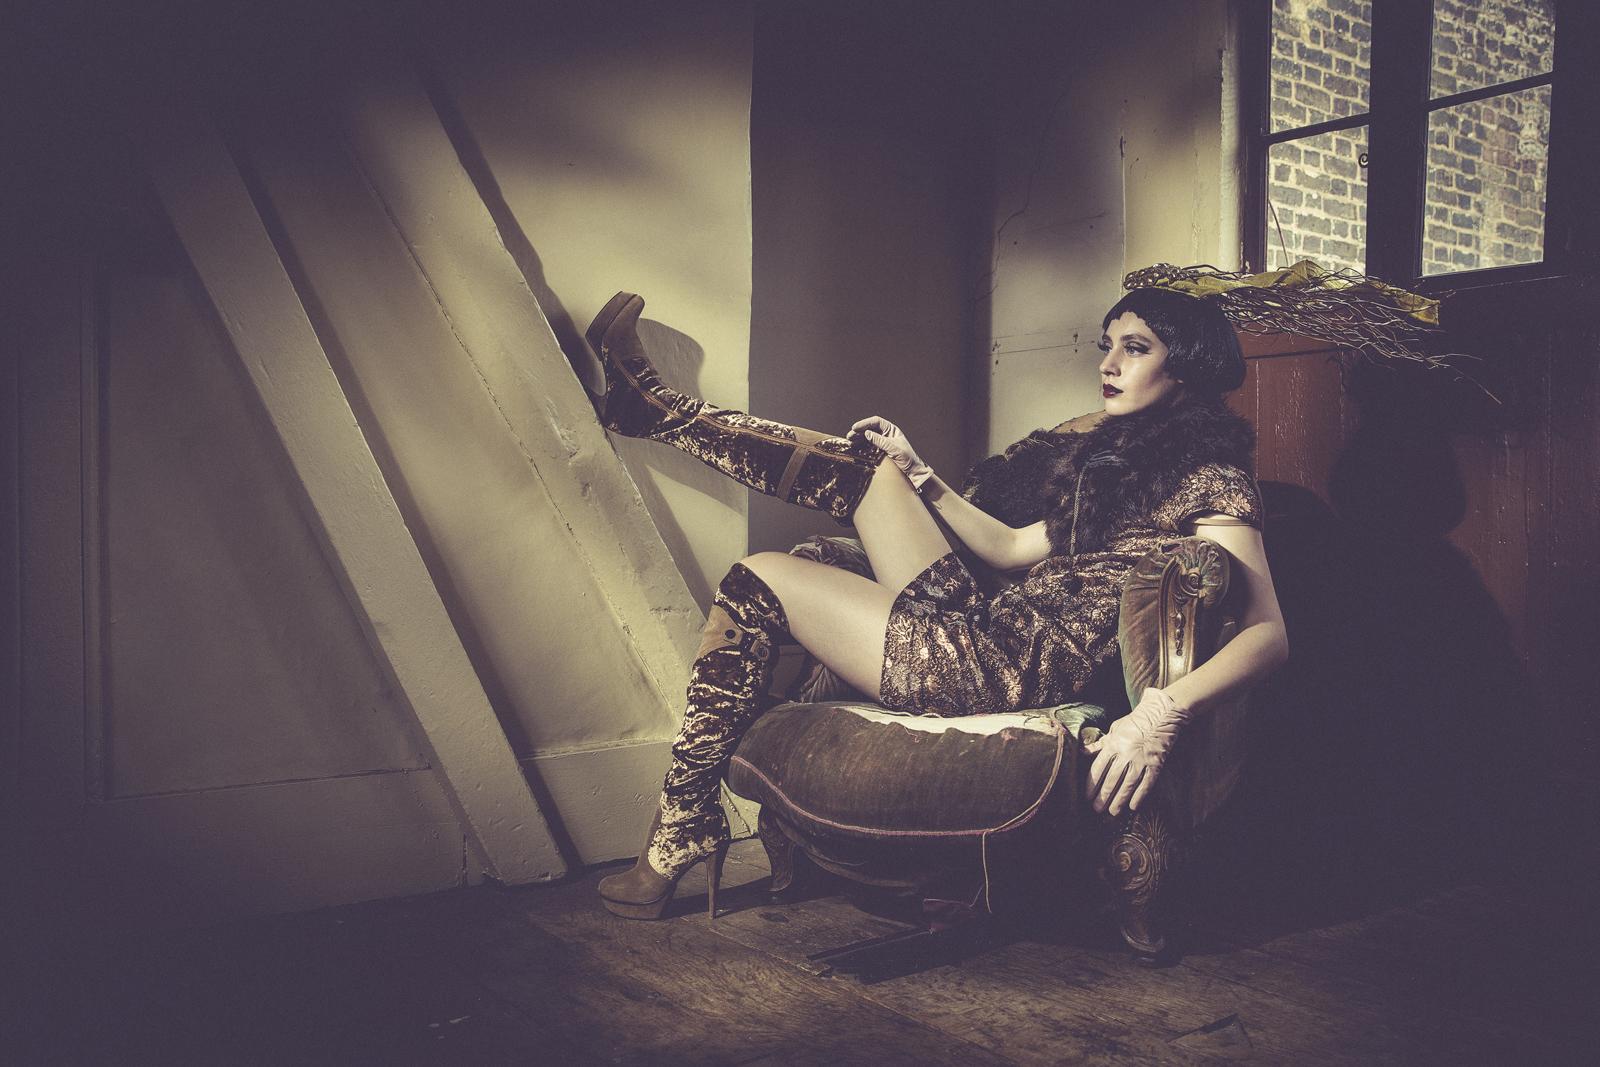 Ian Cashman - Magda Swider - hair Anna Romanenkova - makeup Chandni MUA - headpiece Clea Broad - stole Closet Shop - dress and boots are of stylst - stylist Lisa Fifer